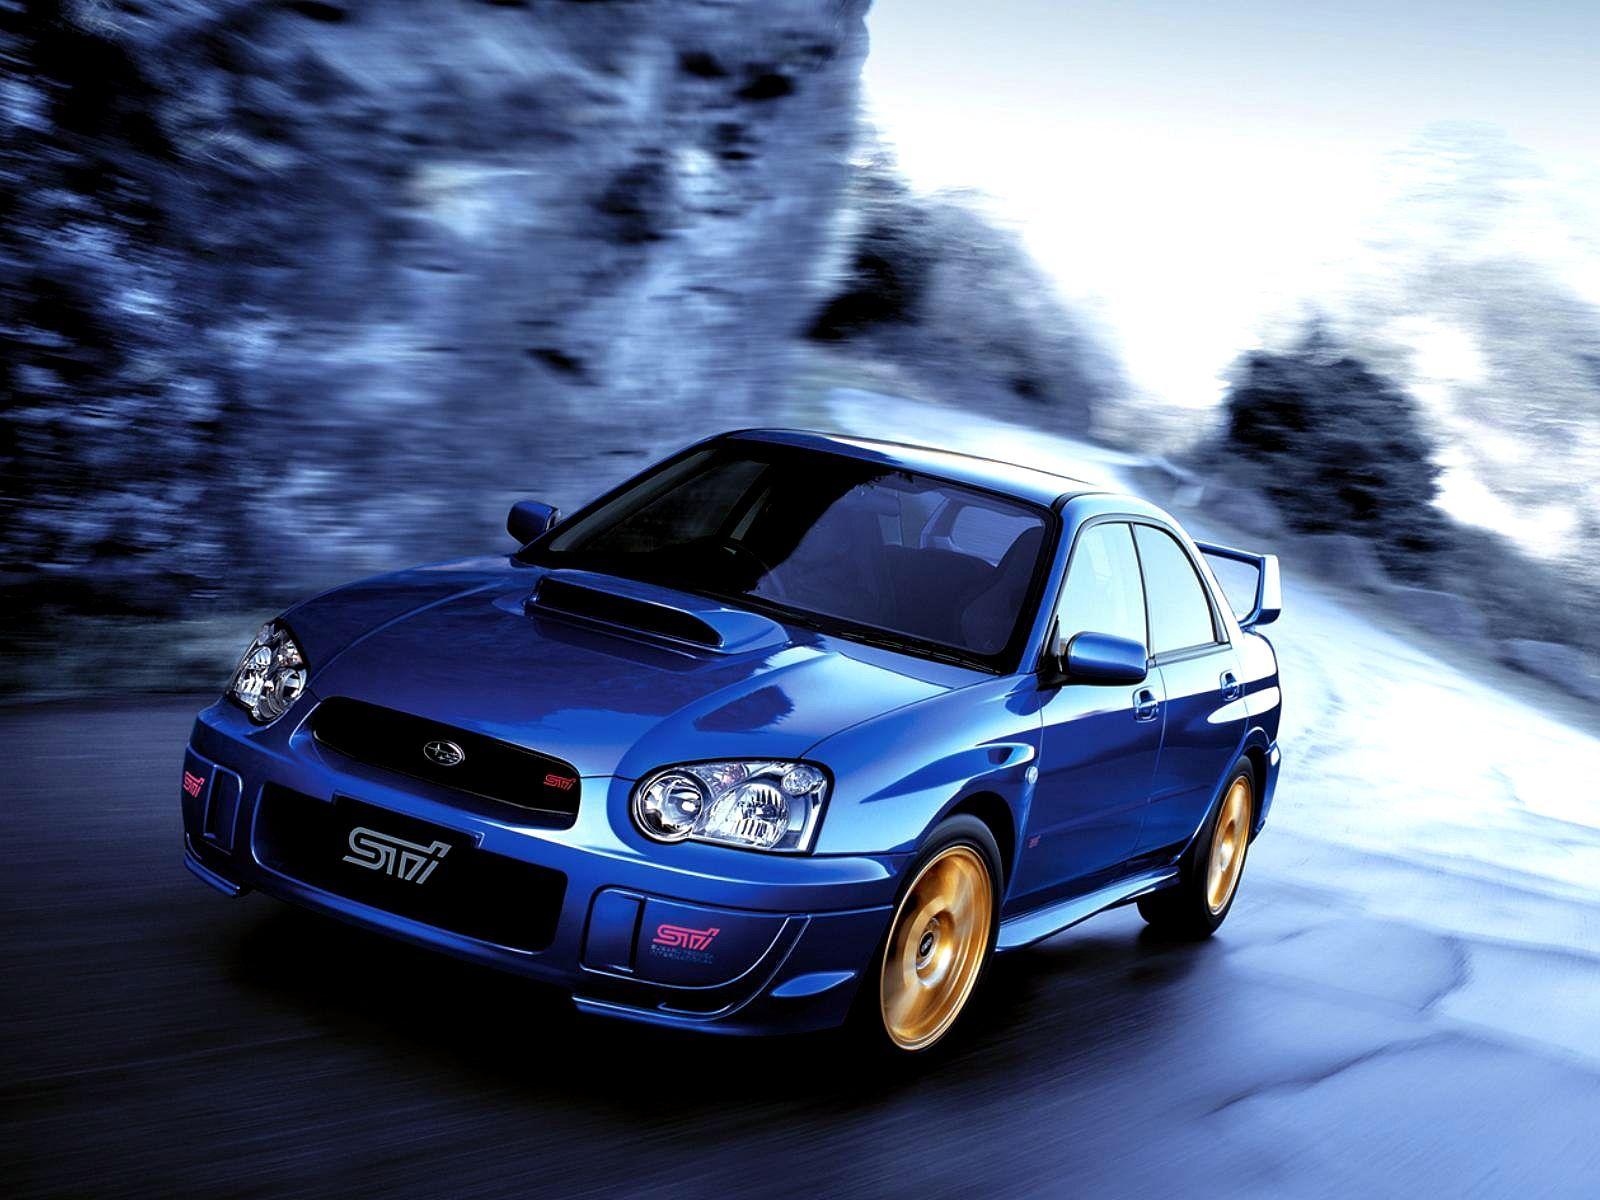 Subaru Impreza Wrx Sti 2004 Wallpaper 1600x1200 Wrx Subaru Impreza Impreza